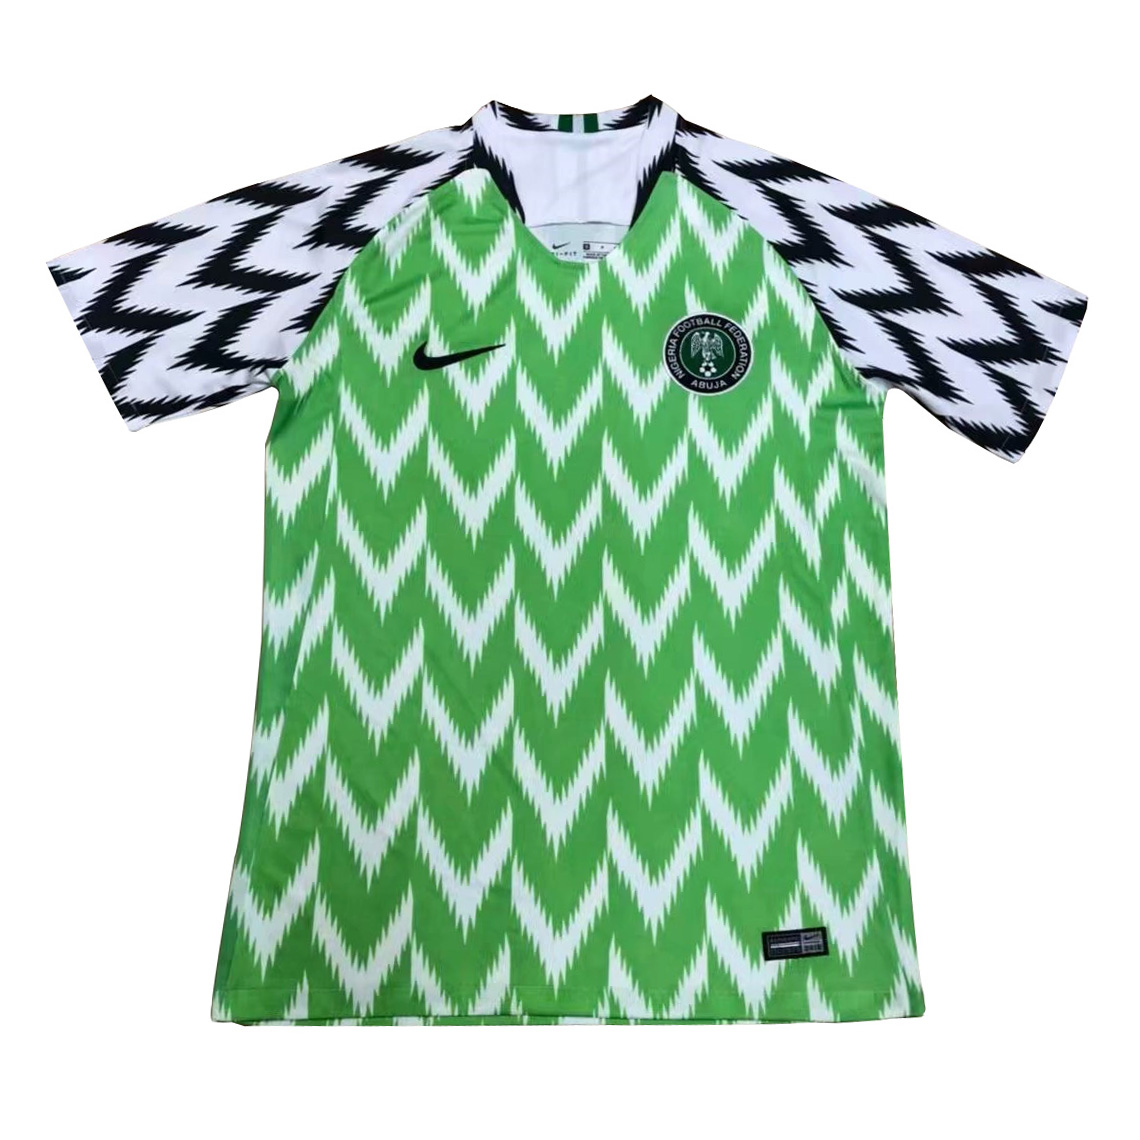 f890d0e3dee US  15.8 - Nigeria FIFA World Cup 2018 Home Jersey Men -  www.yajerseyclub.com